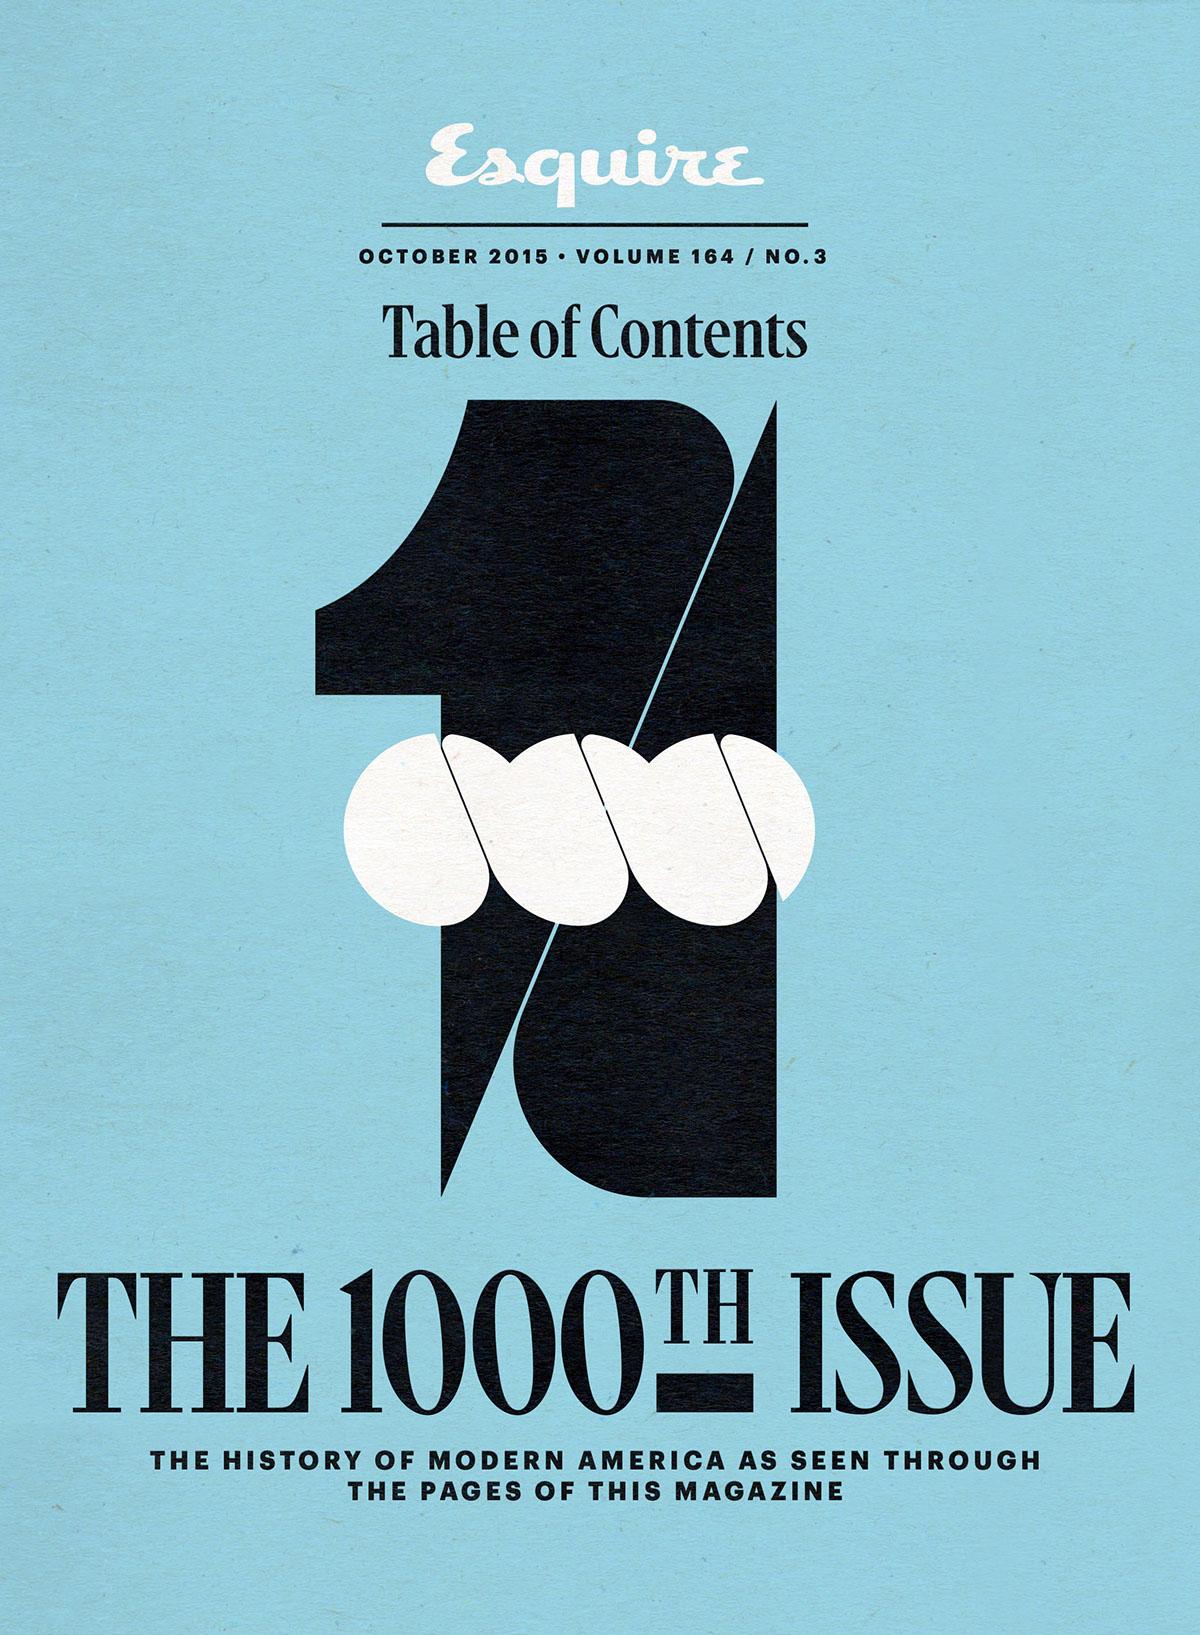 Esquire Magazine n° 1000, Sawdust, 2015.